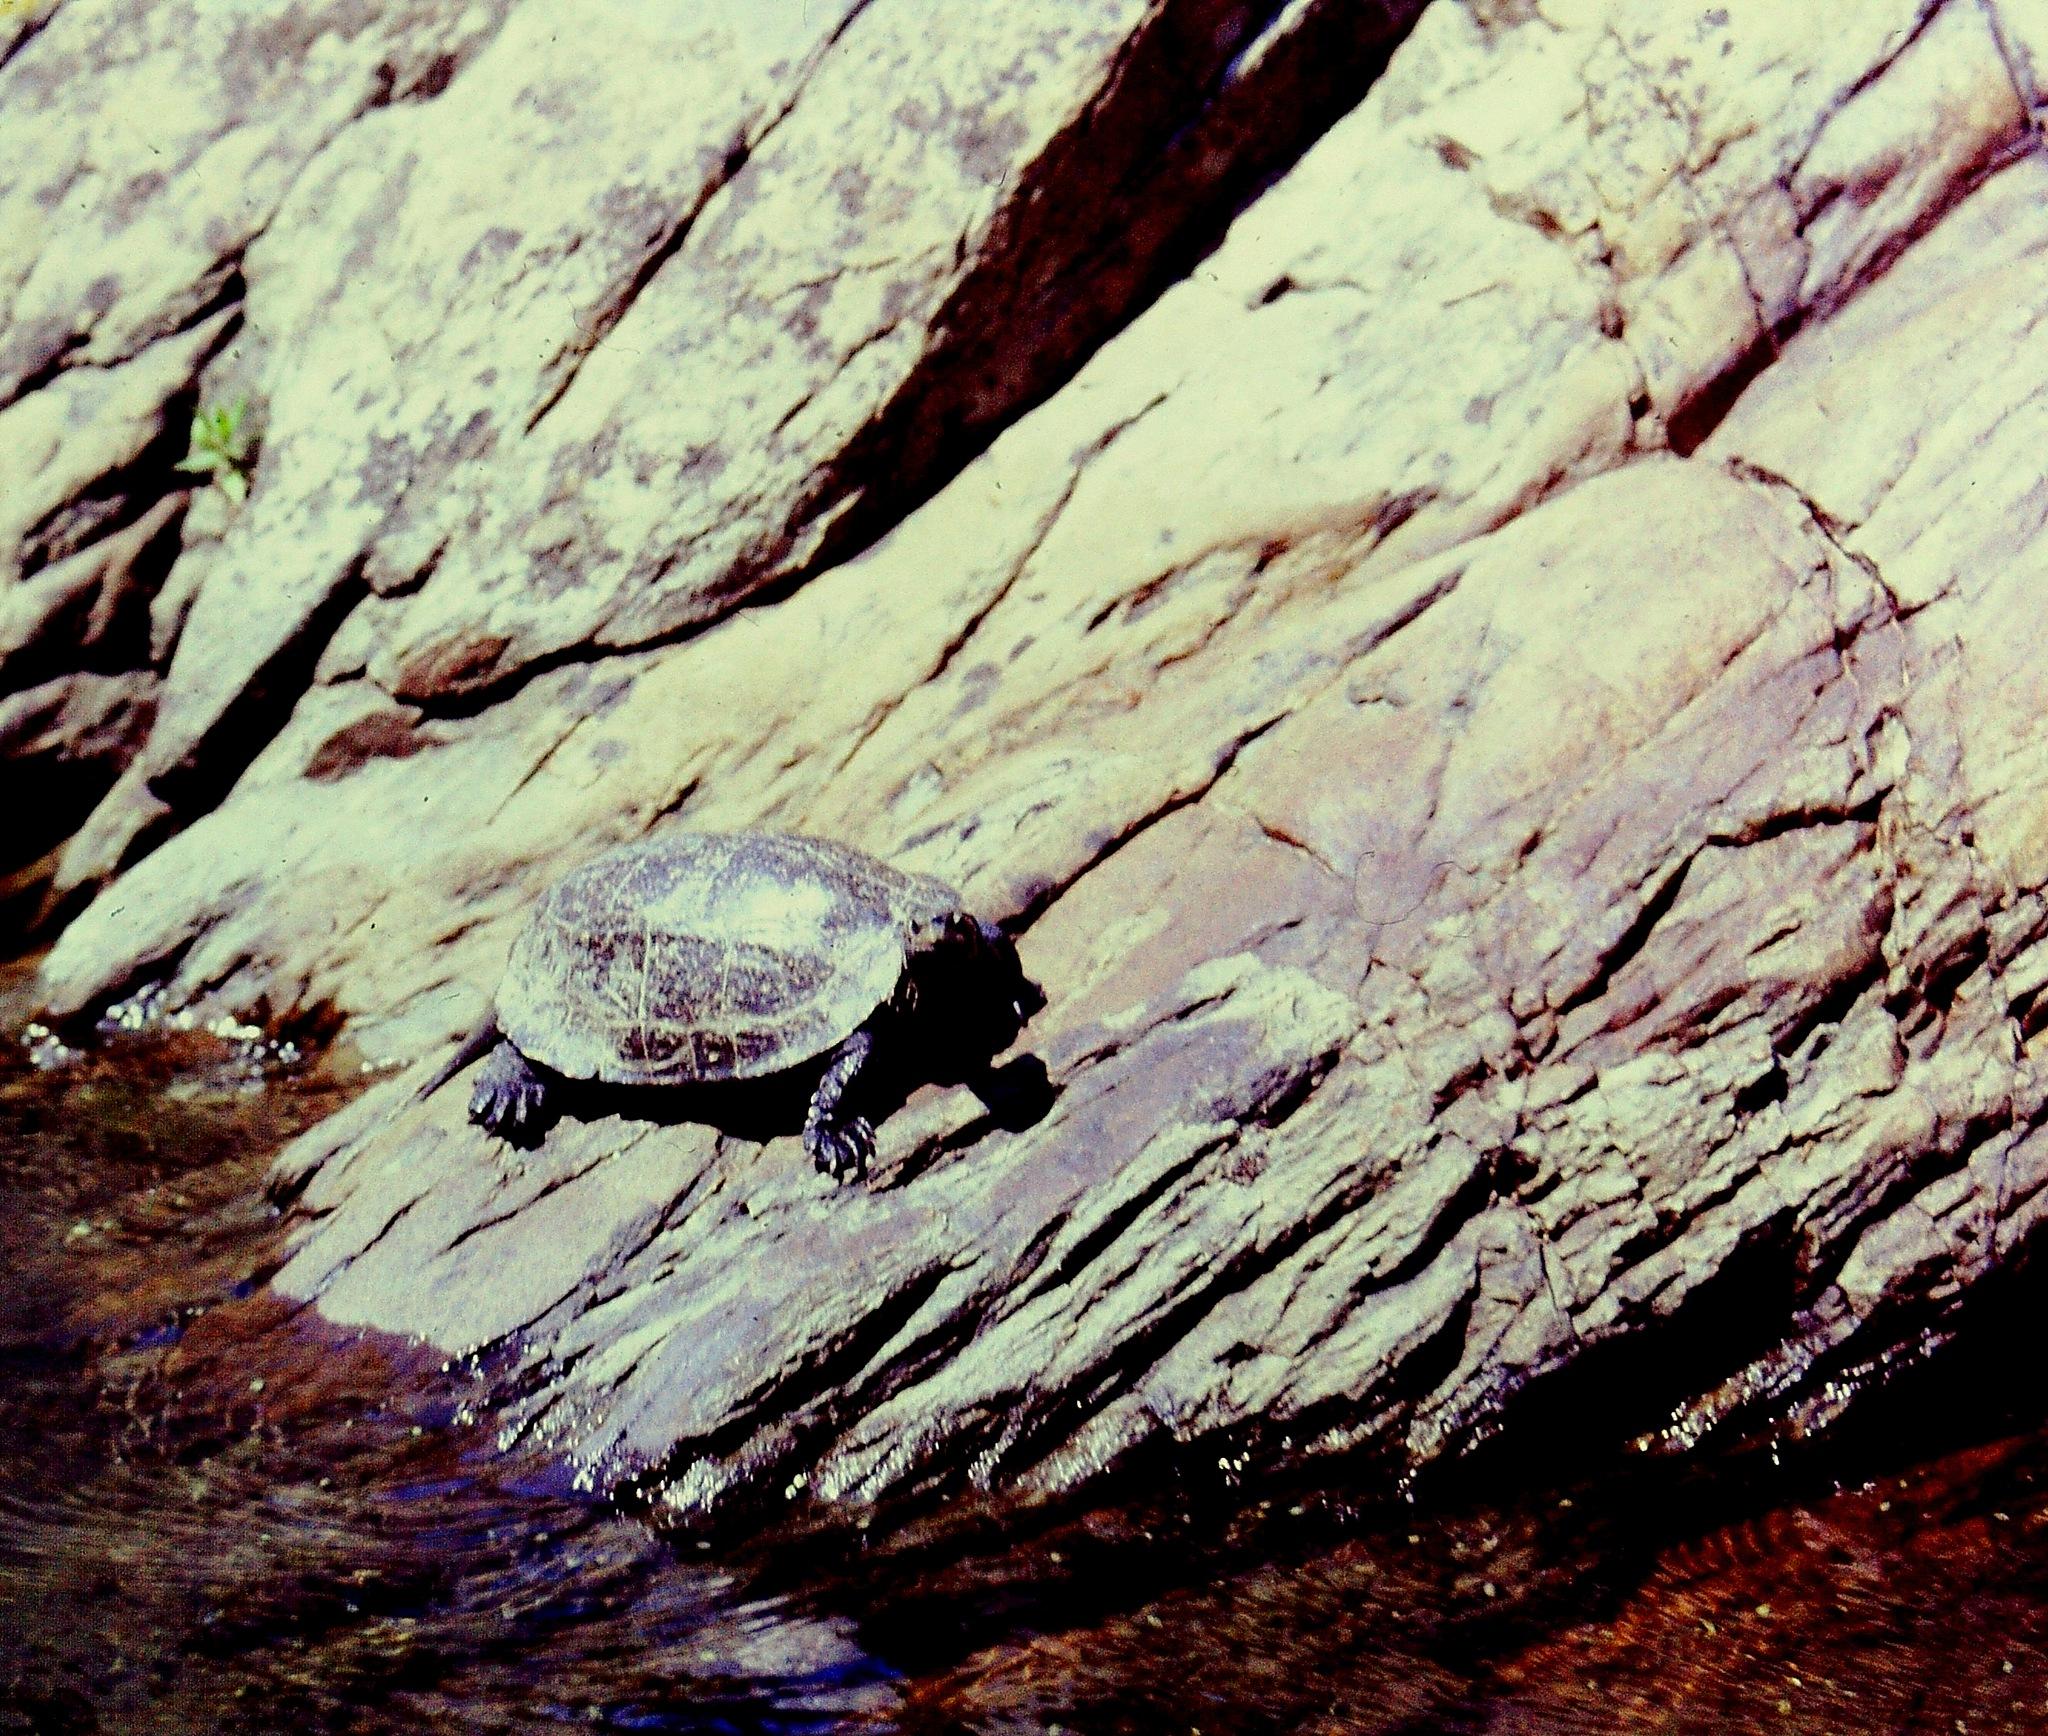 SEA TURTLE GETTING SOME SUNSHINE, FULL SCREEN by Akin Saner